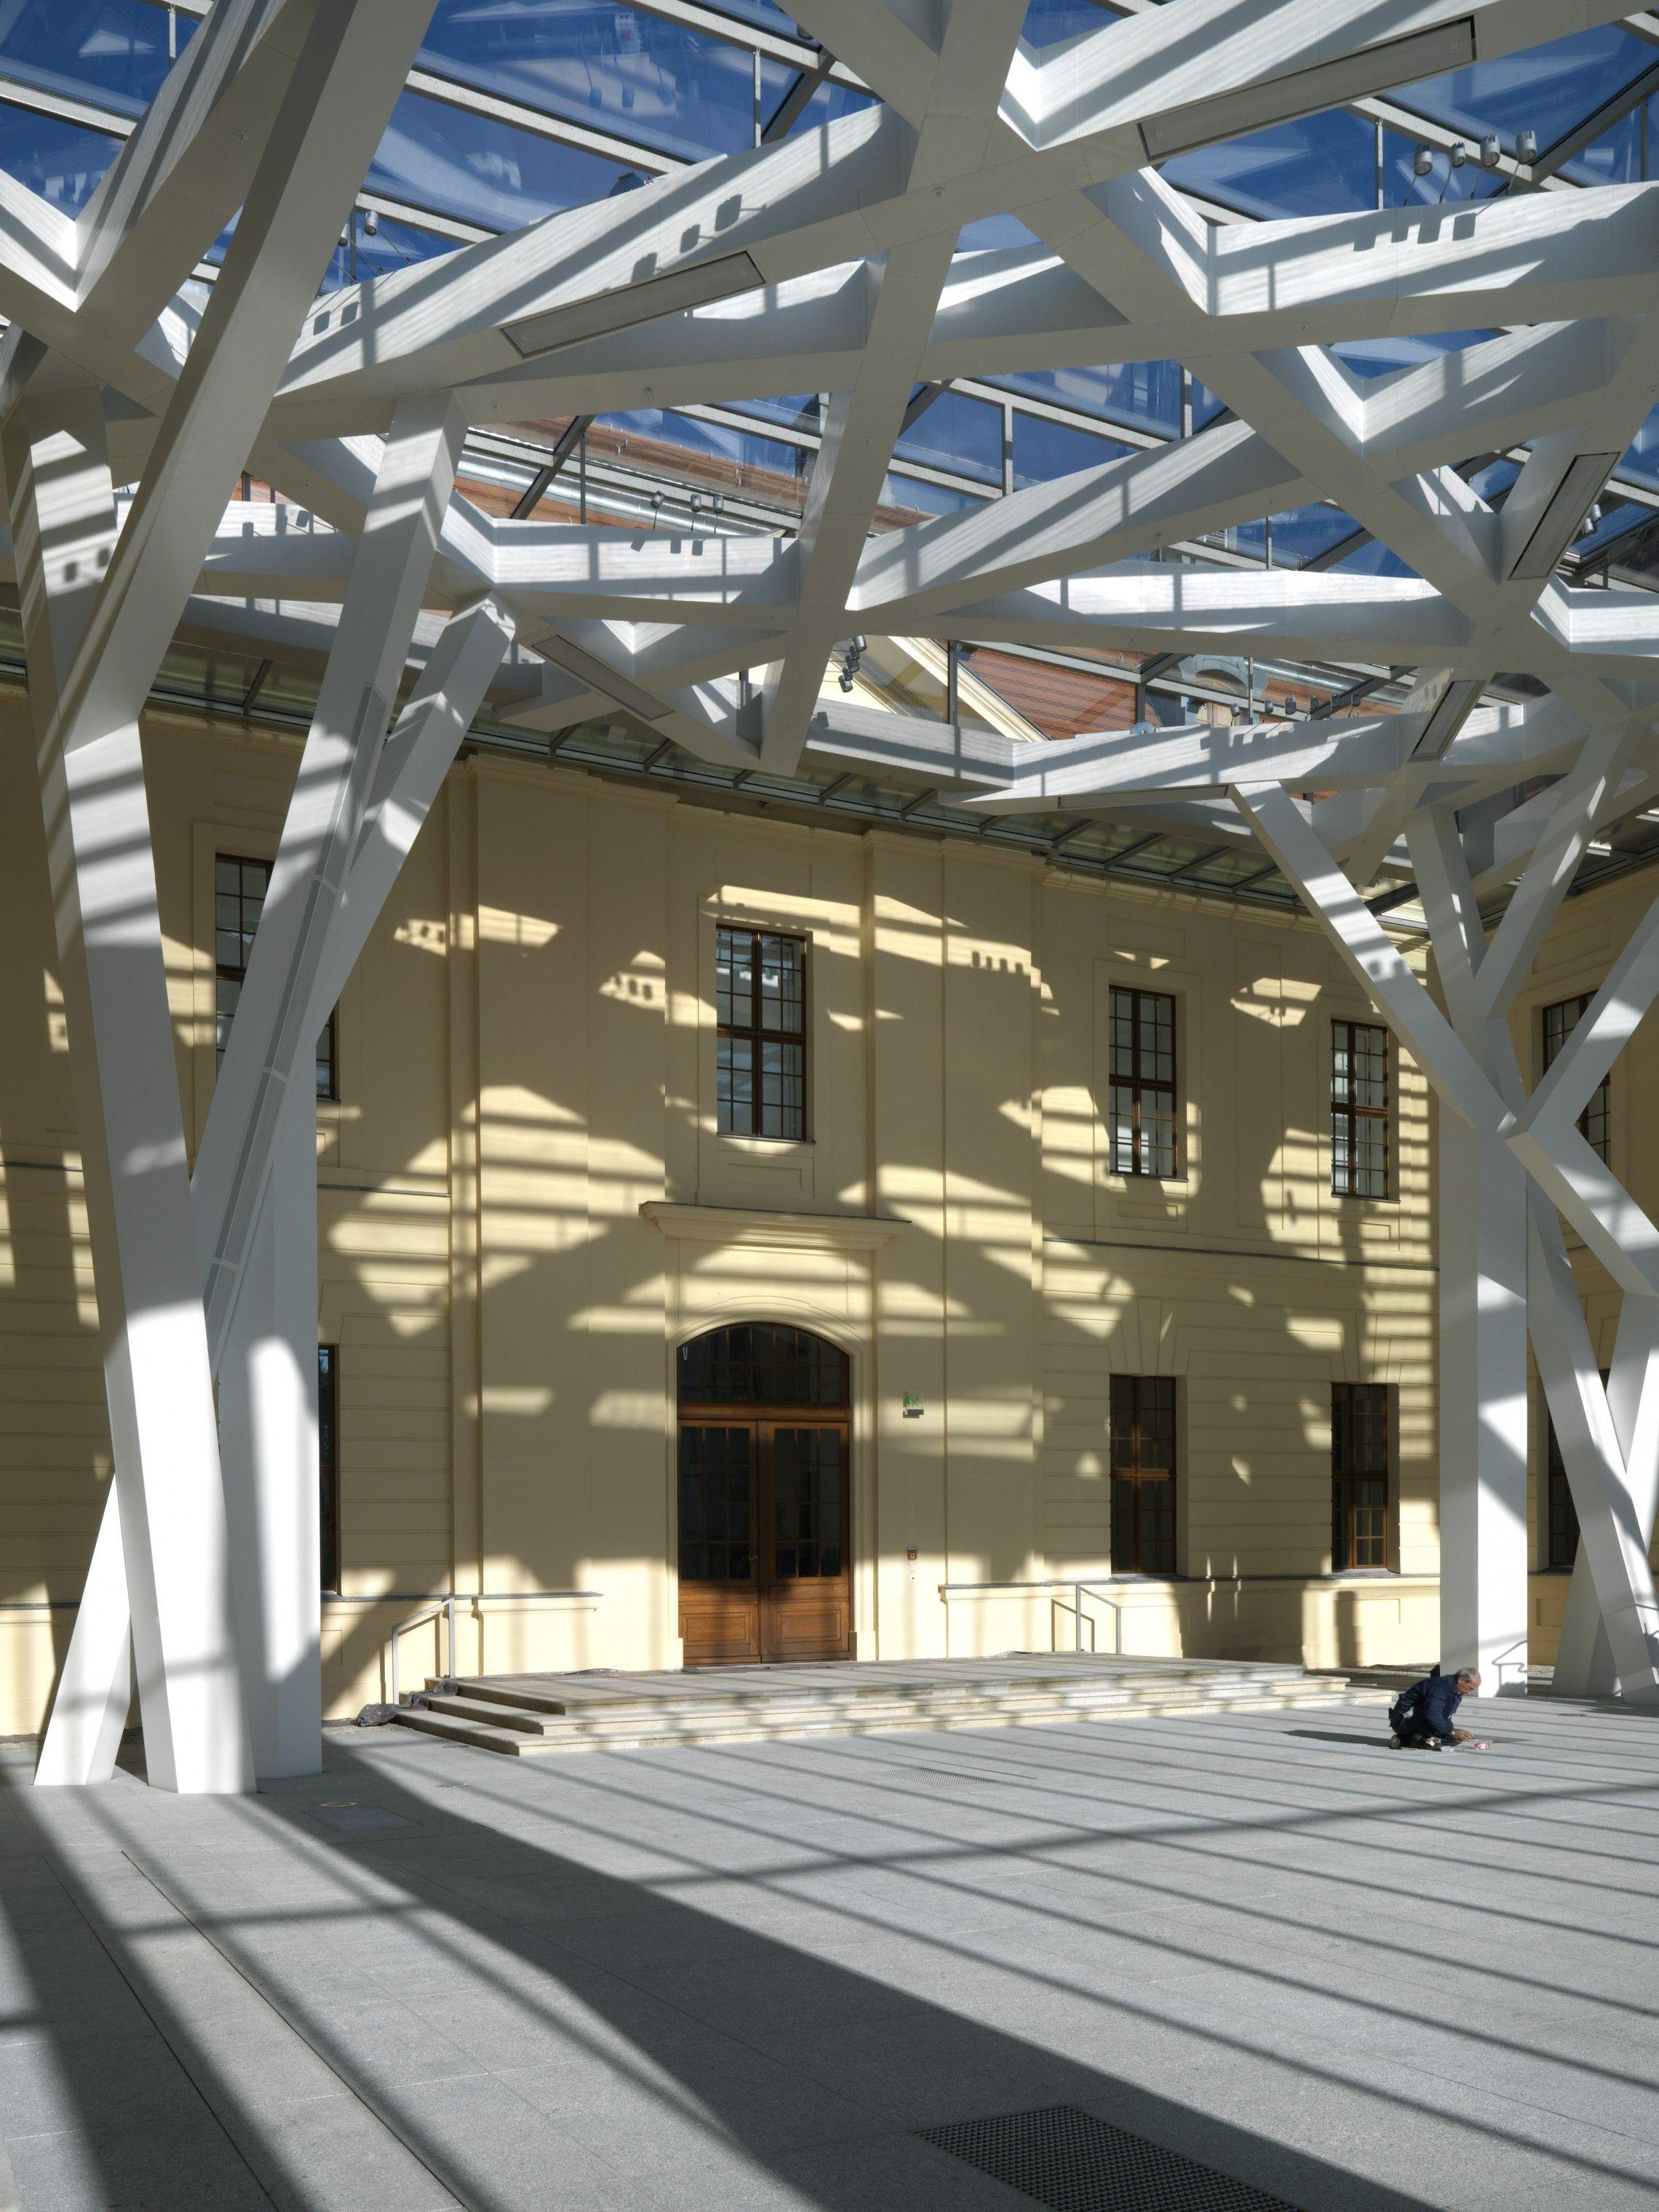 Glass Courtyard Jewish Museum Berlin Libeskind In 2020 Jewish Museum Berlin Glass Building Architecture